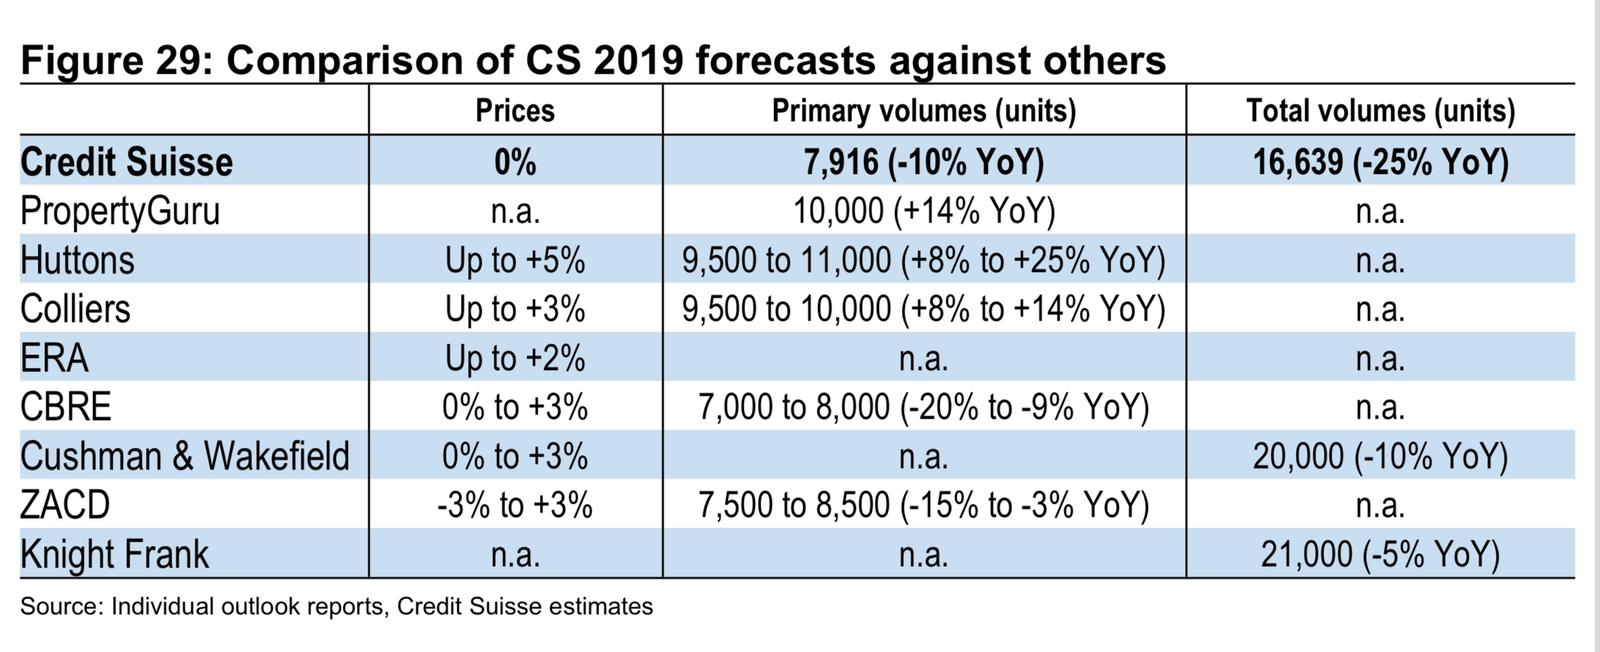 Comparison of 2019 forecasts 不同机构对新加坡房产2019走势的分析